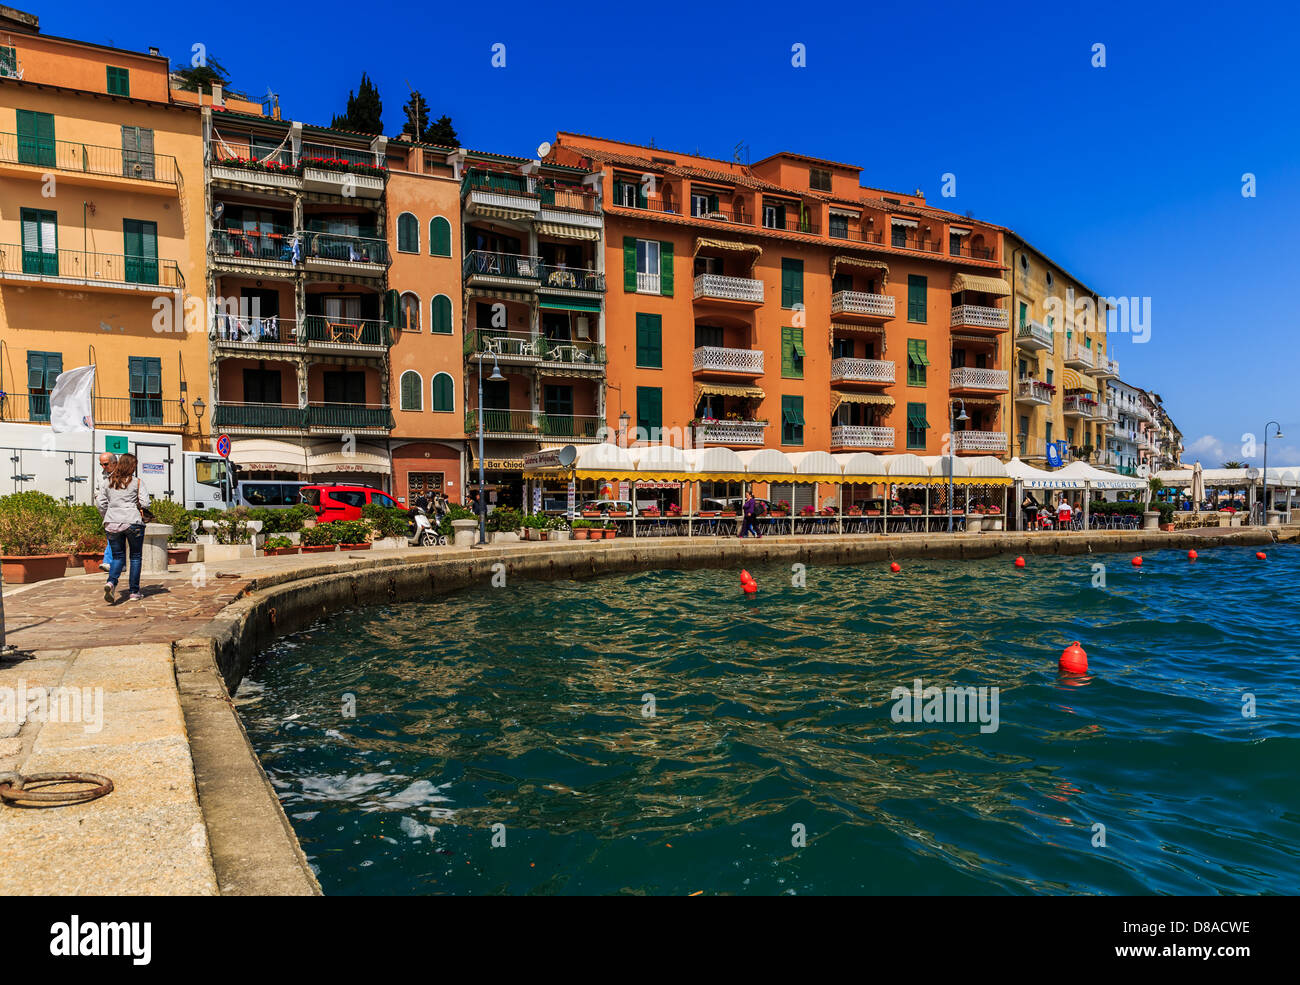 Harbor front in Porto Santo Stefano, Monte Argentario, Maremma, Grosseto Province, Tuscany, Italy - Stock Image